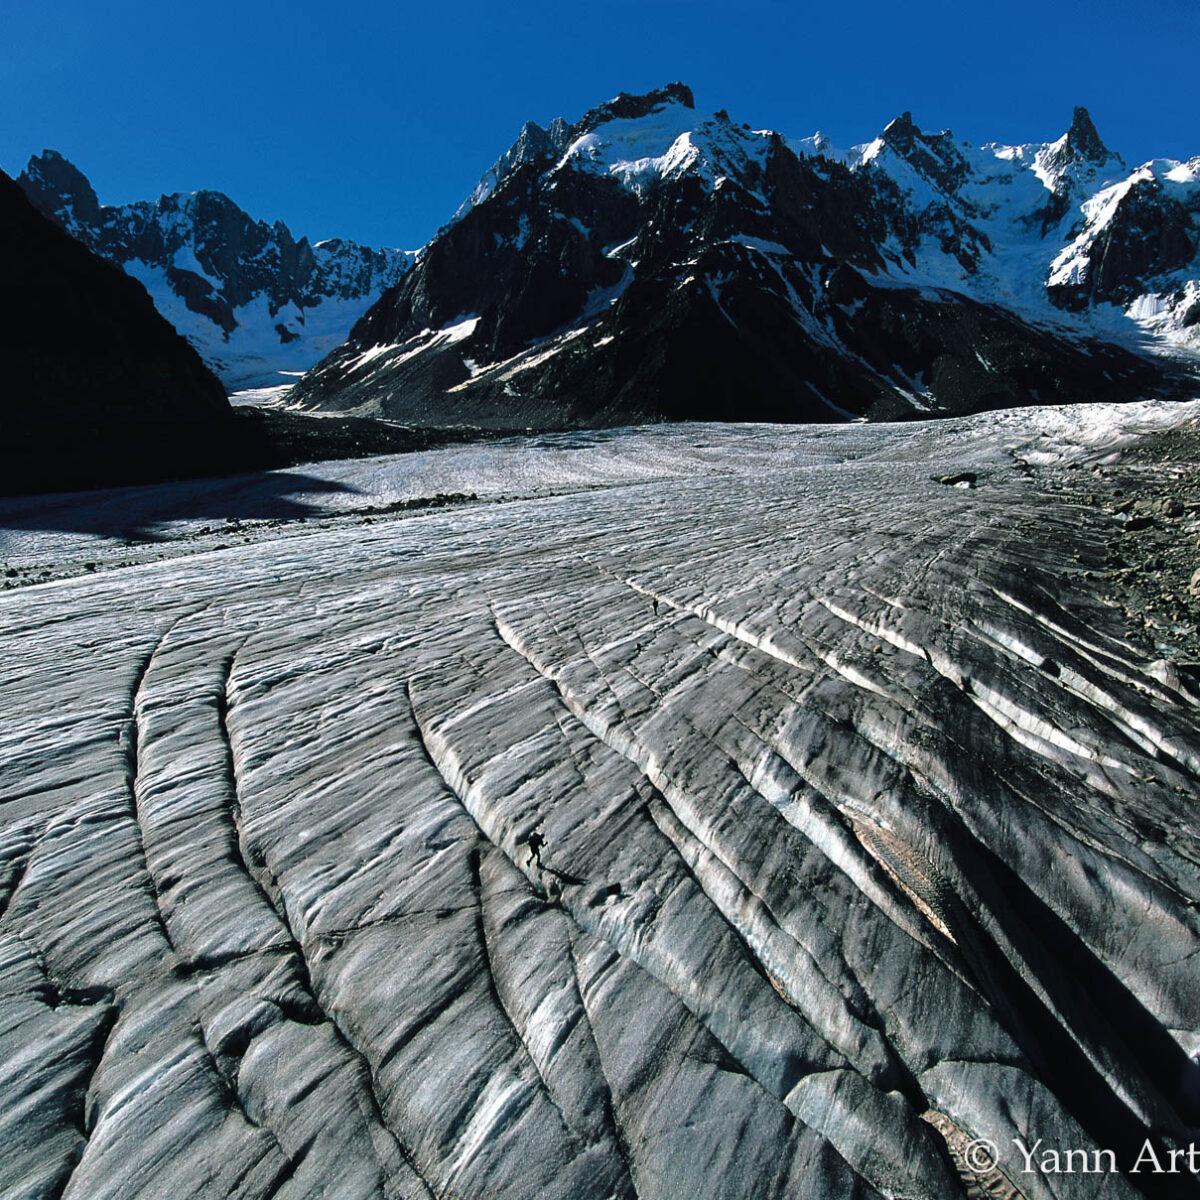 Mer de glace Chamonix France